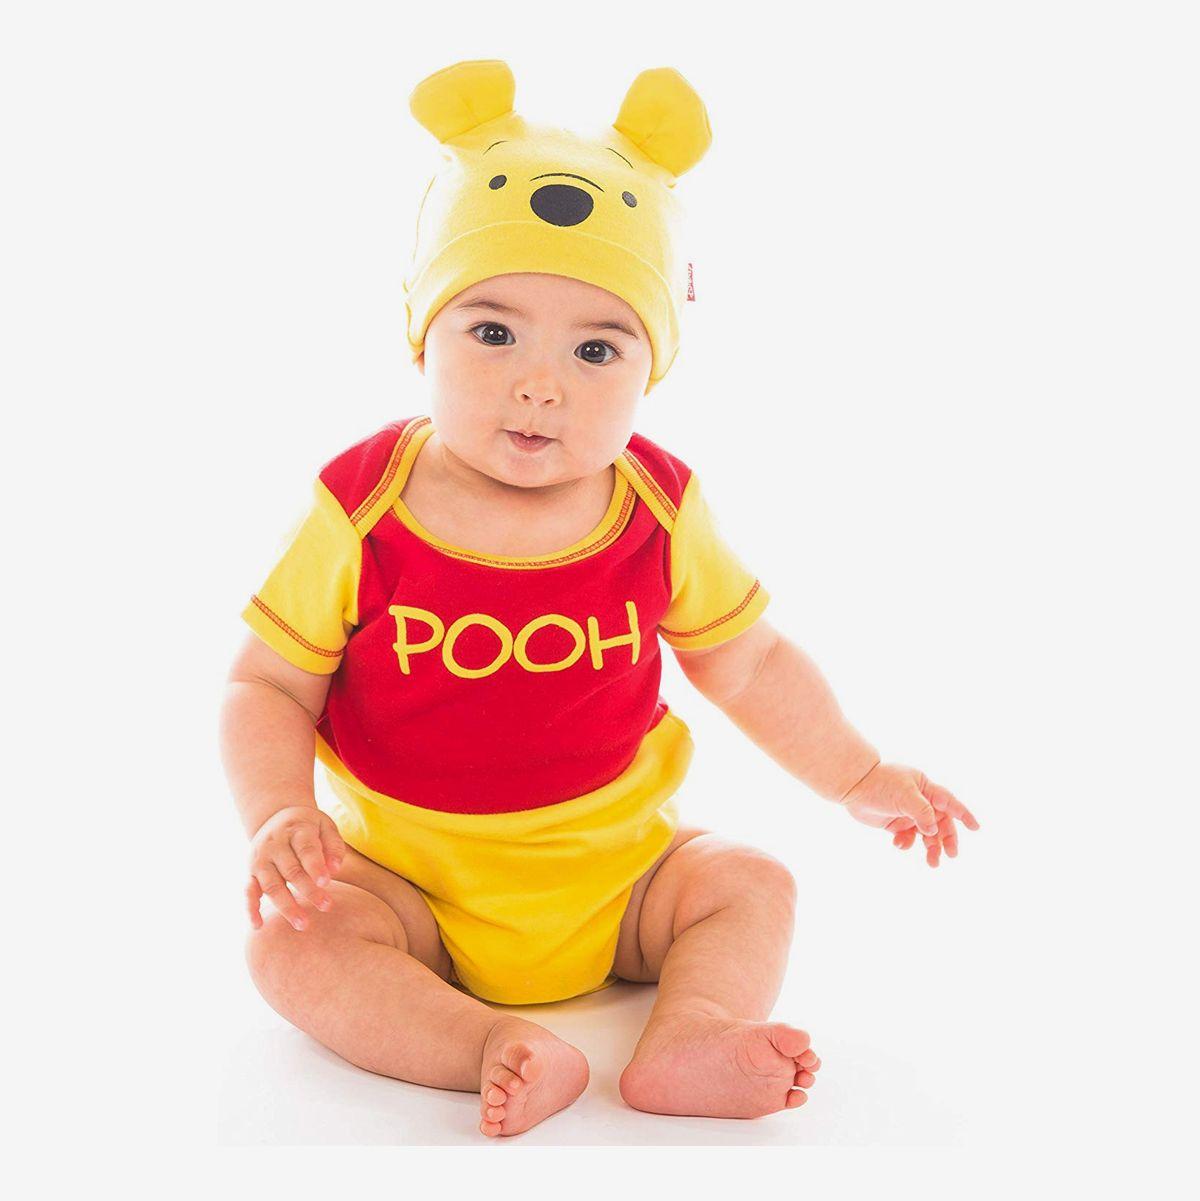 12 Best Baby Halloween Costumes 2020 The Strategist New York Magazine